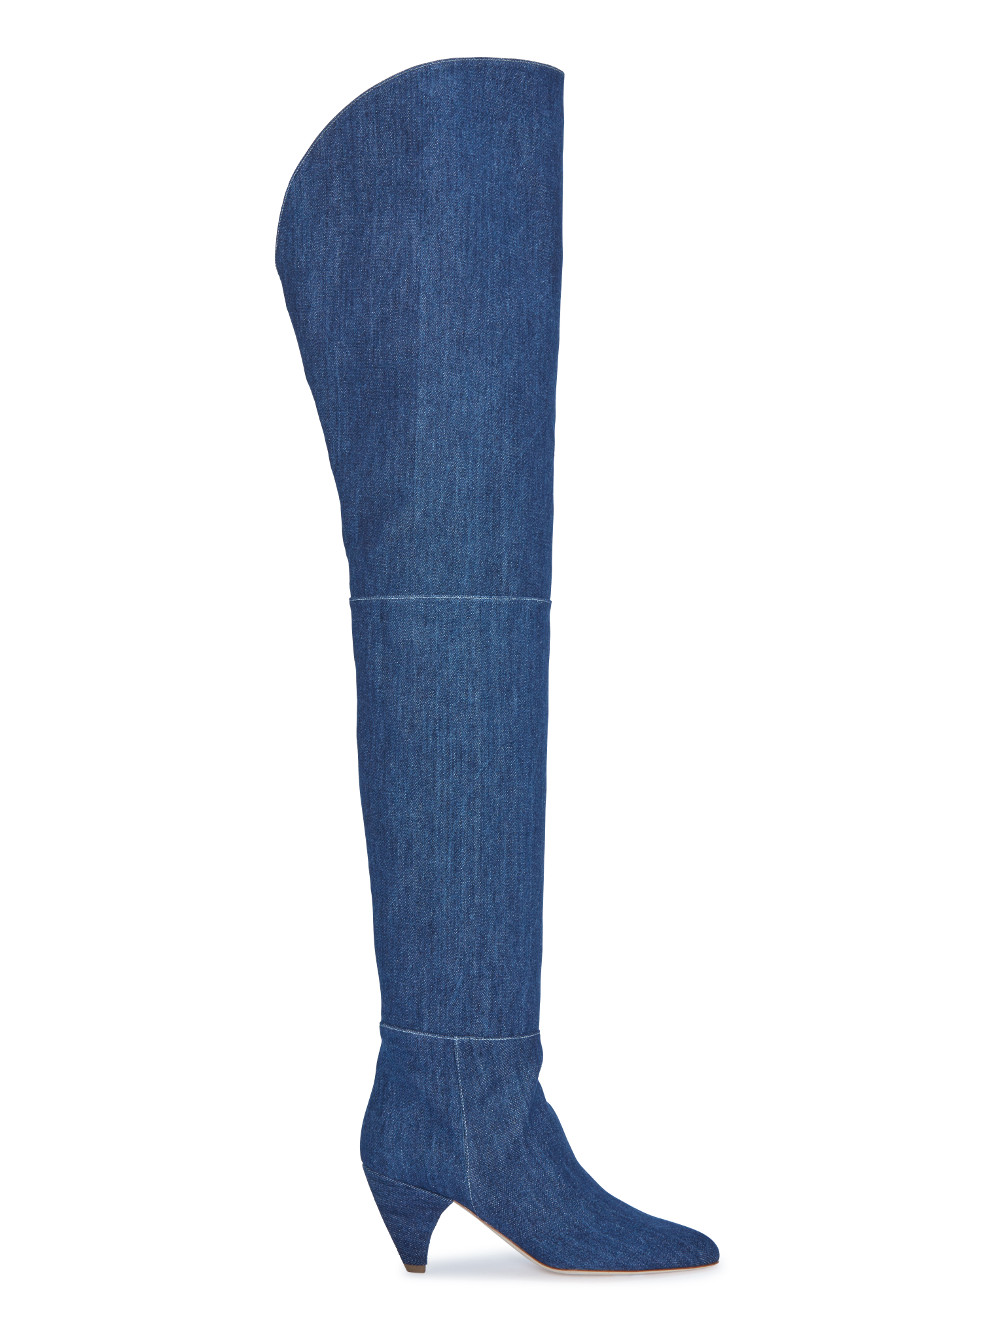 LD_PF18_Solweig_Jeans Blue_5678.jpg